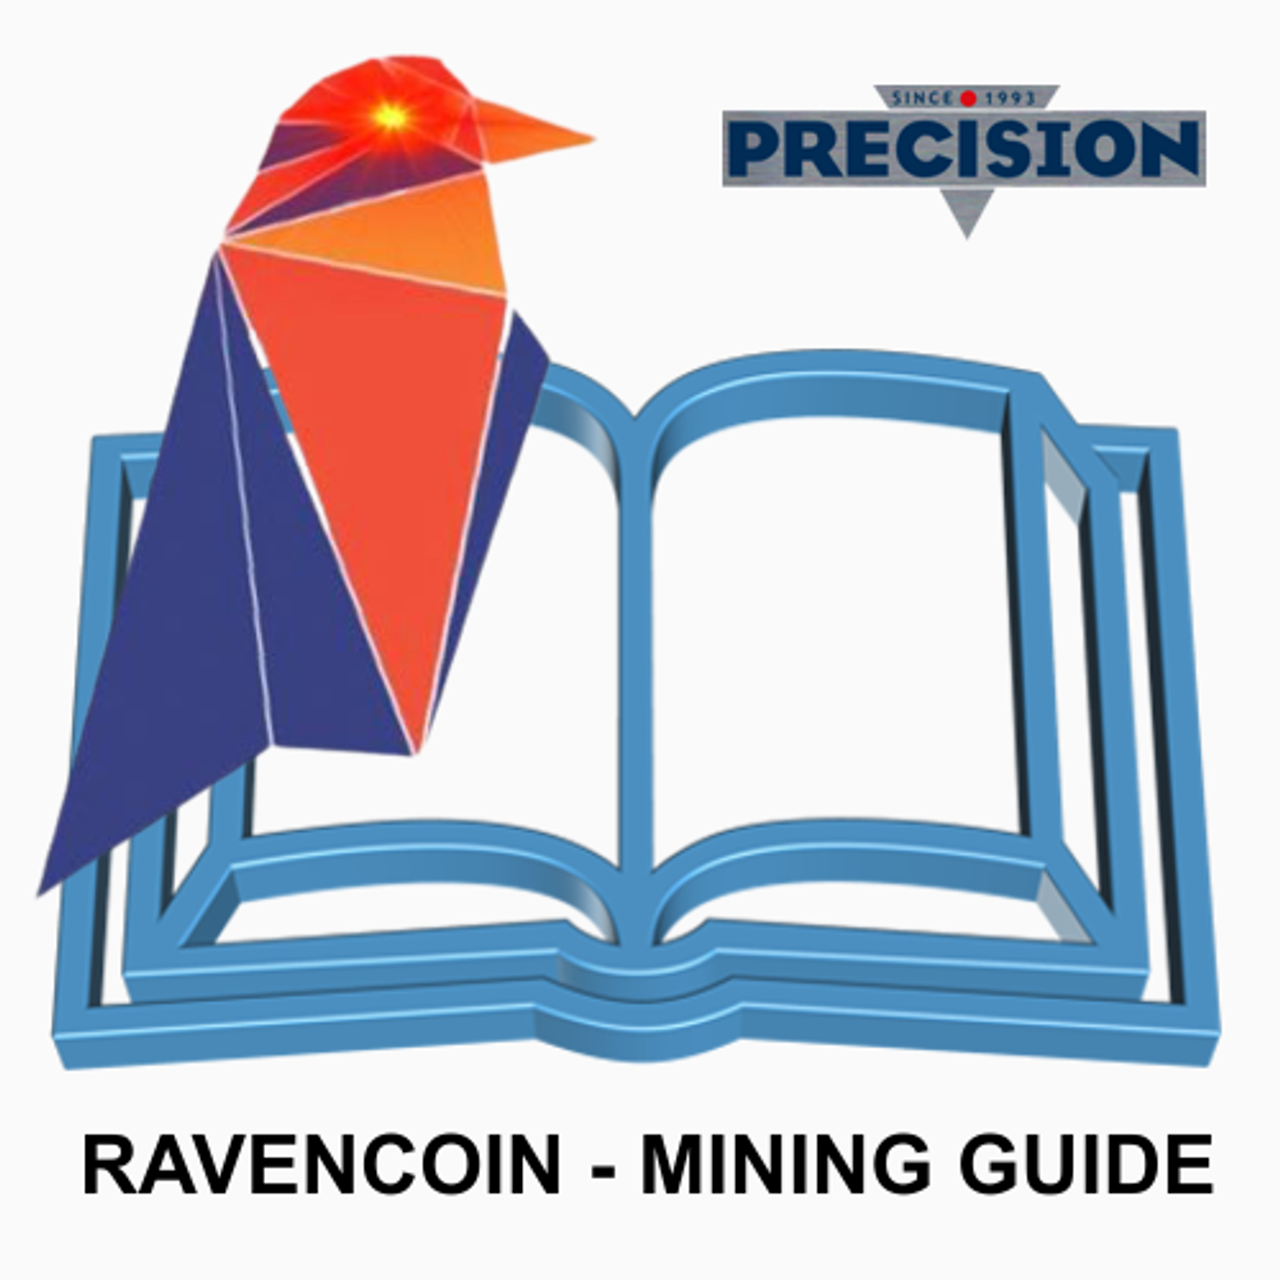 Ravencoin Mining Guide